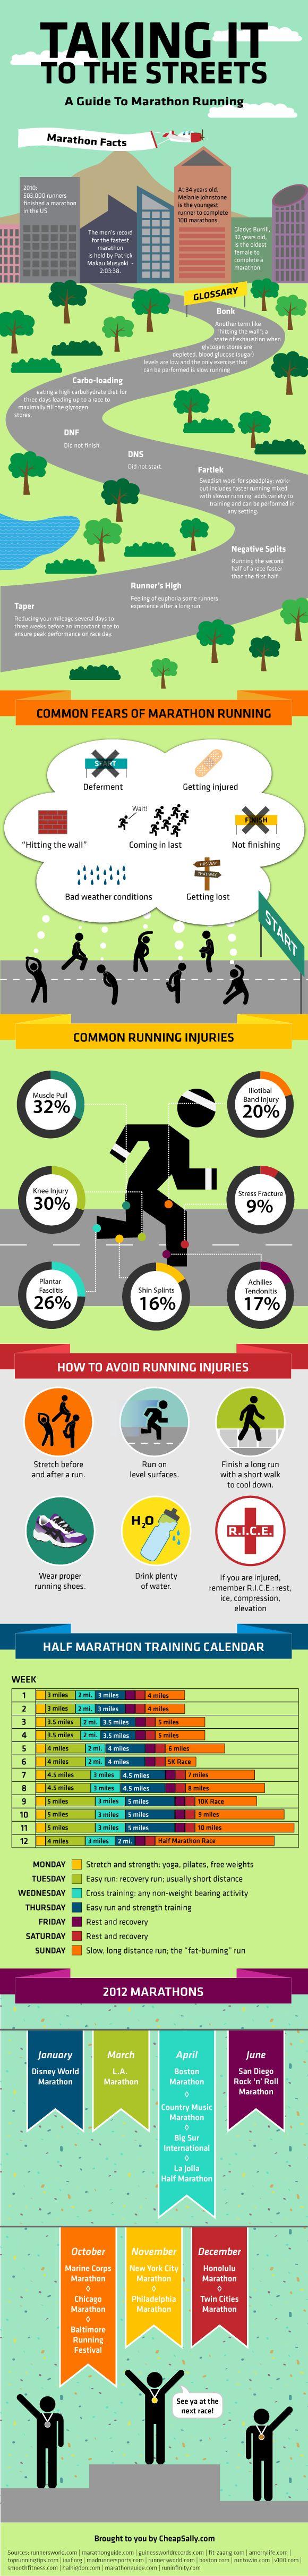 infographic guide to marathon running.